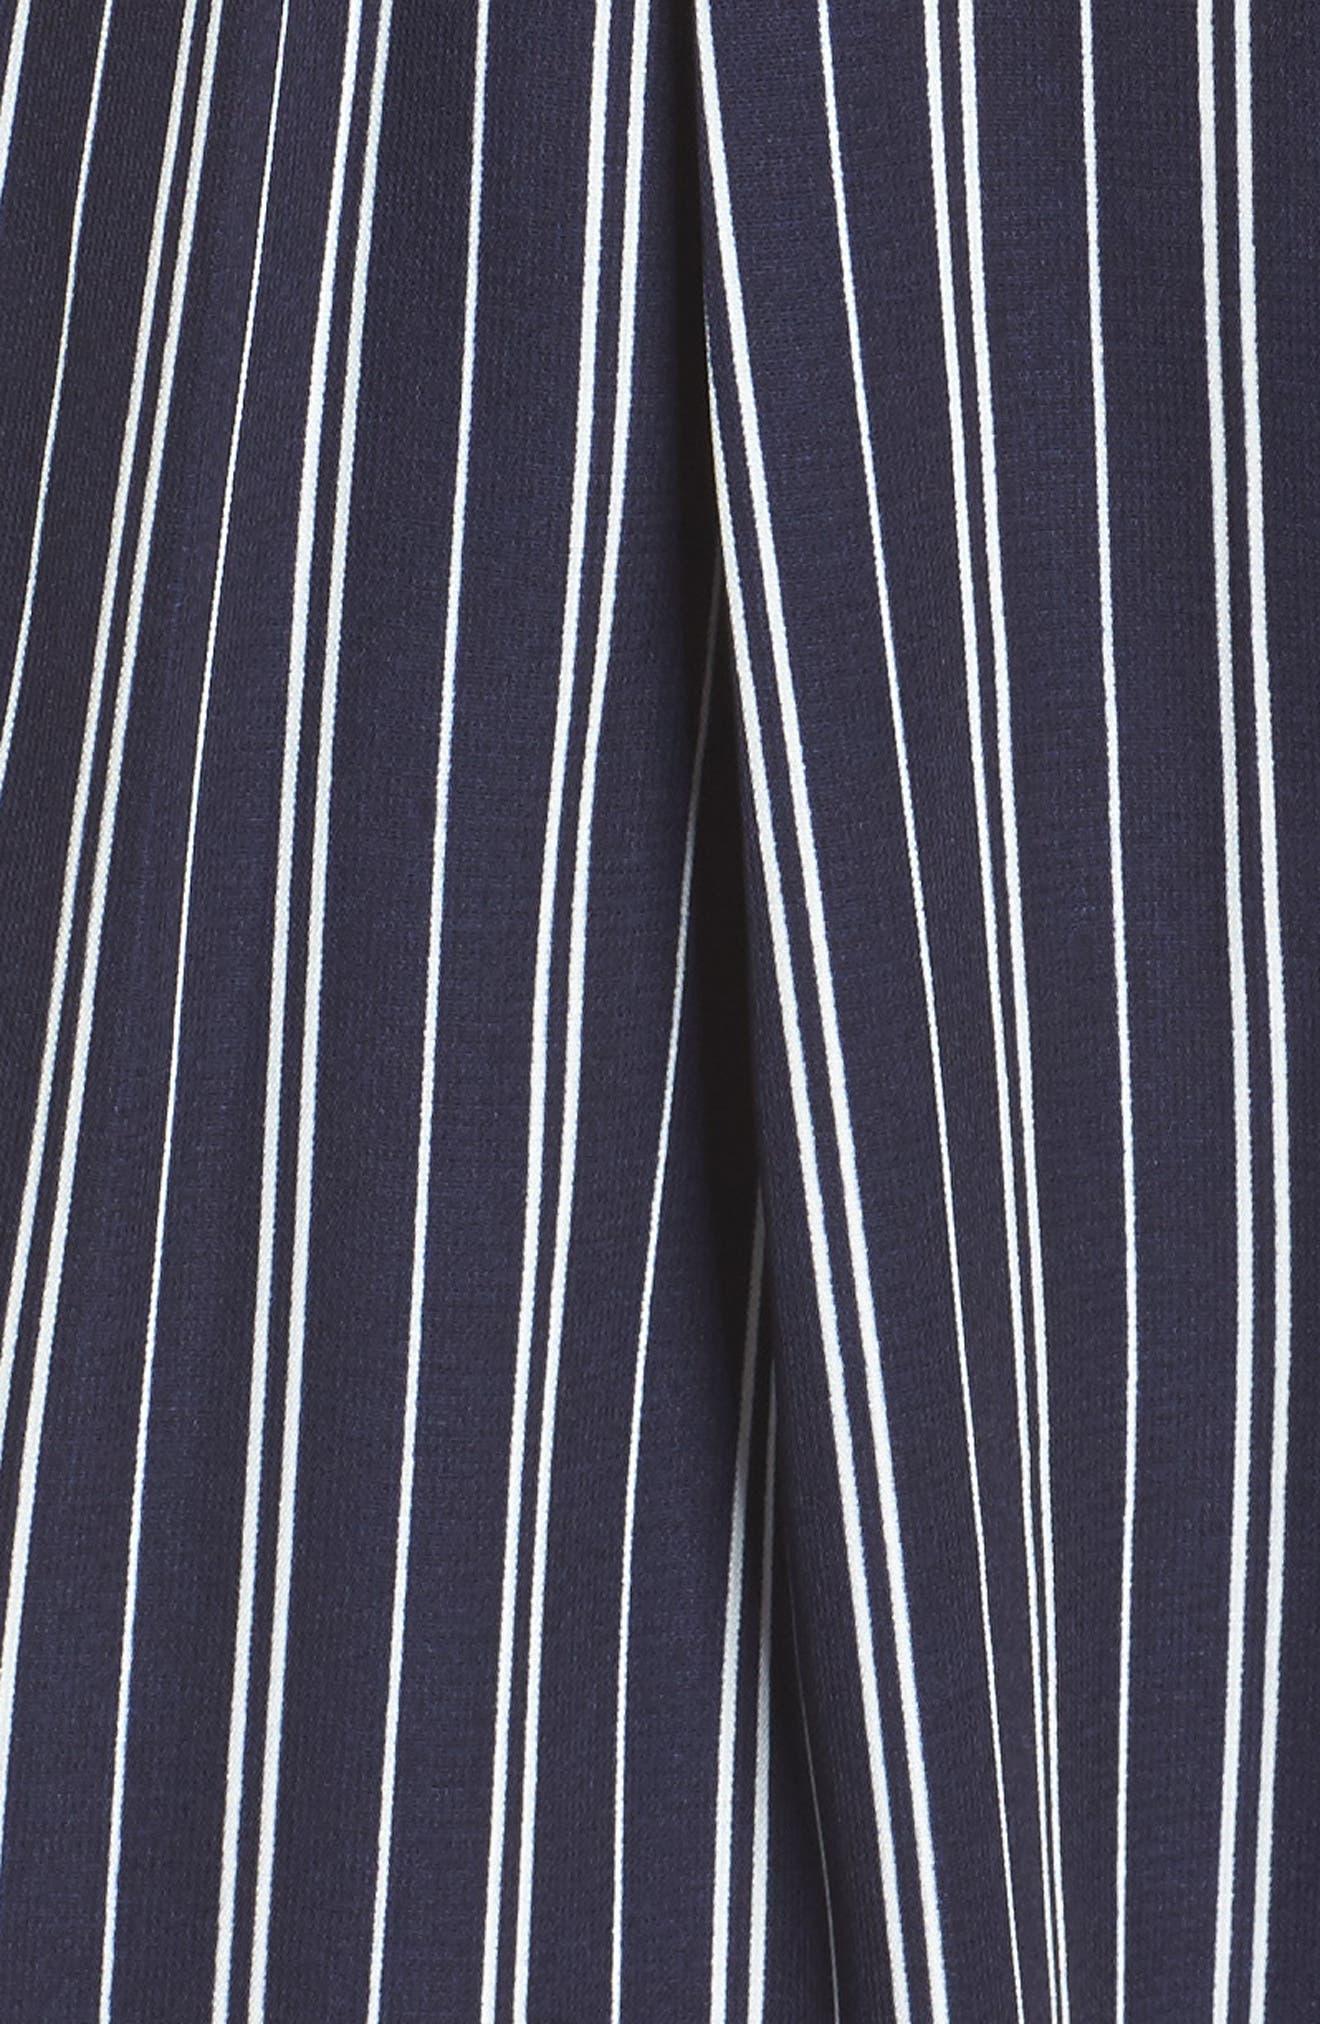 Stripe Off the Shoulder Crop Jumpsuit,                             Alternate thumbnail 5, color,                             Navy Ivory Stripe